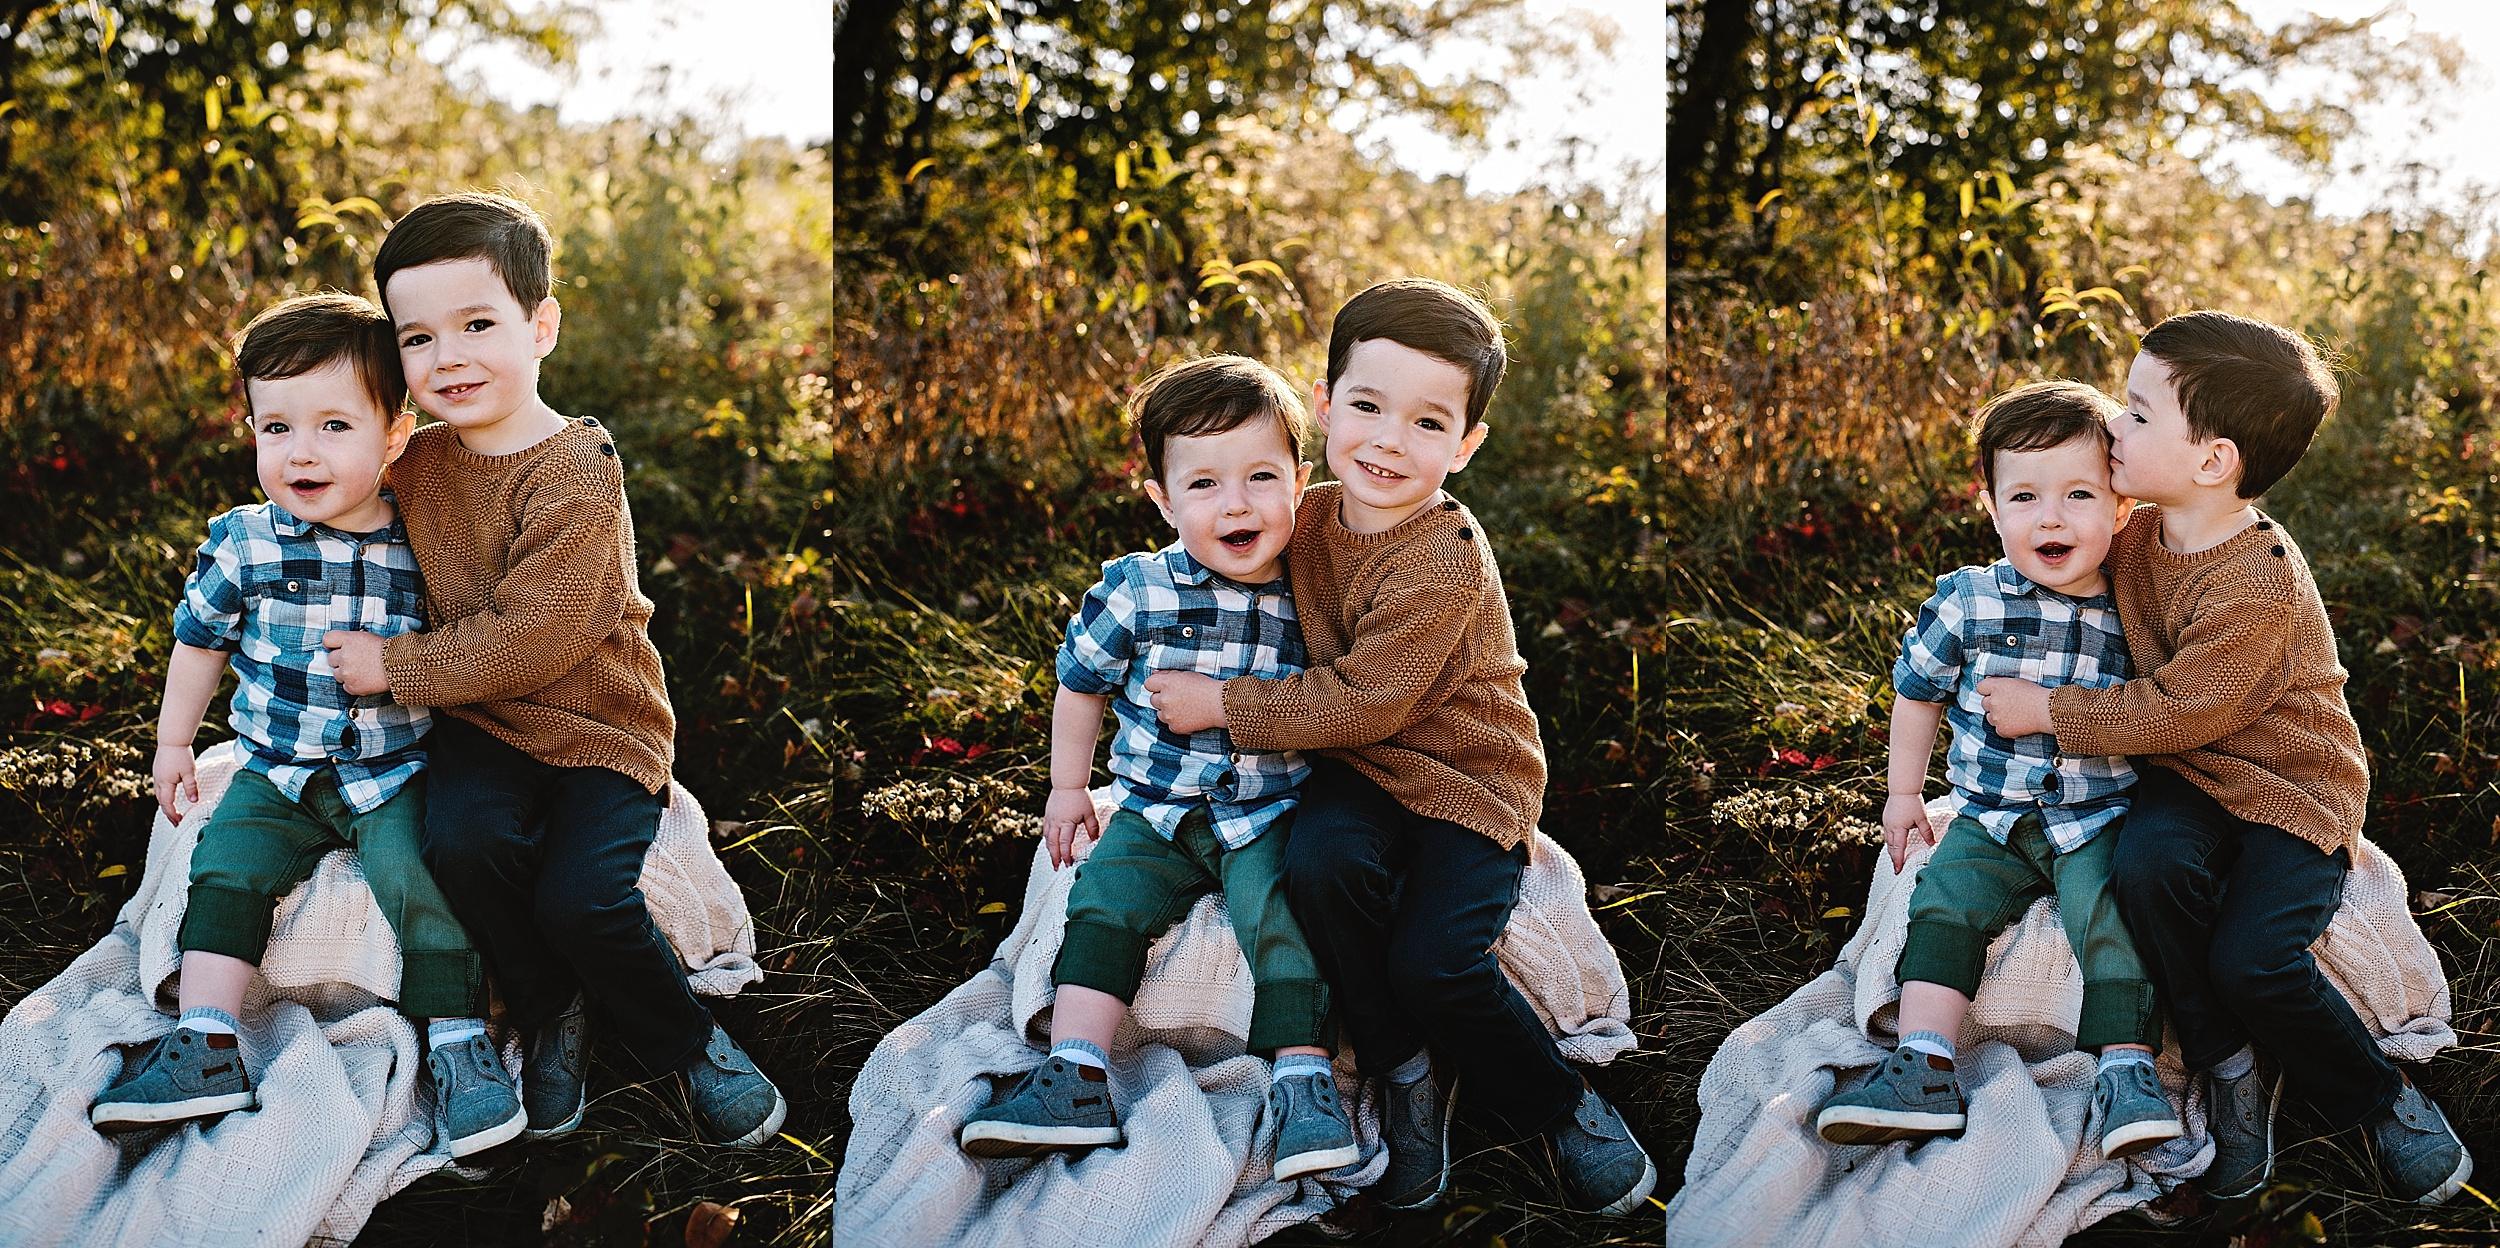 lauren-grayson-photography-portrait-artist-akron-cleveland-ohio-photographer-family-session-fields-sunset-fall_0168.jpg